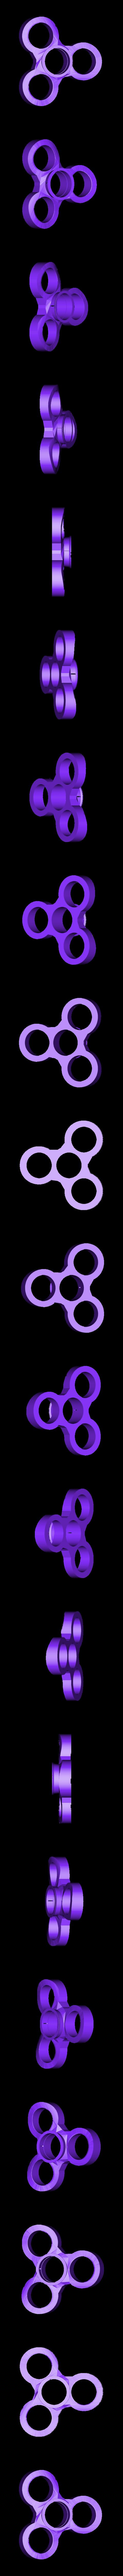 Hand_spinner_aero_lanceur.stl Download STL file Thrower Hand Spinner • 3D print design, 3d-fabric-jean-pierre